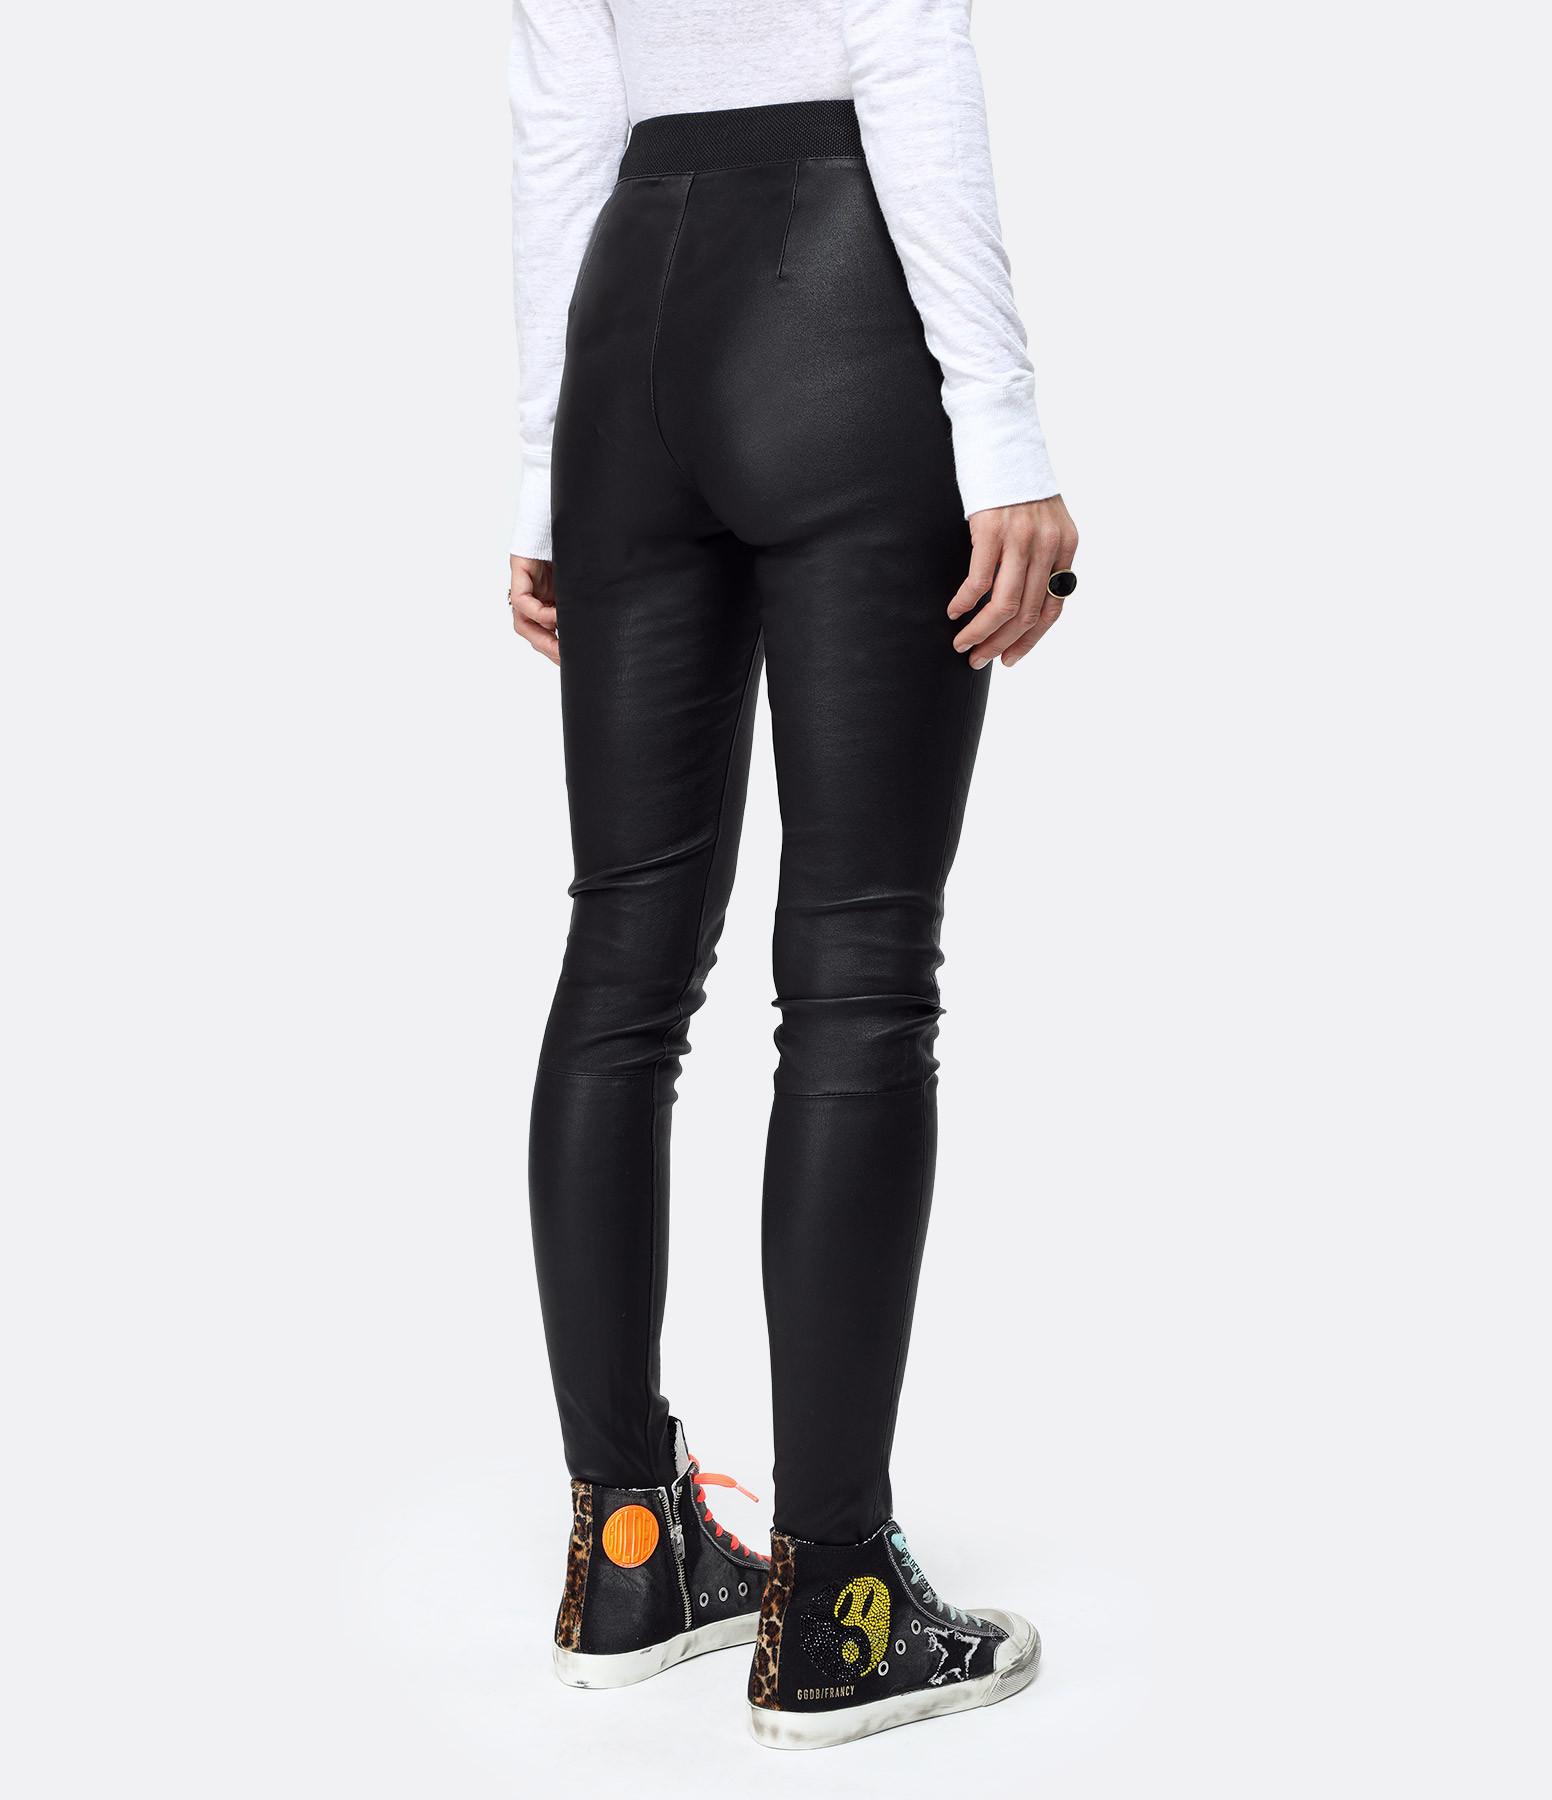 MUUBAA - Legging STR Cuir Noir